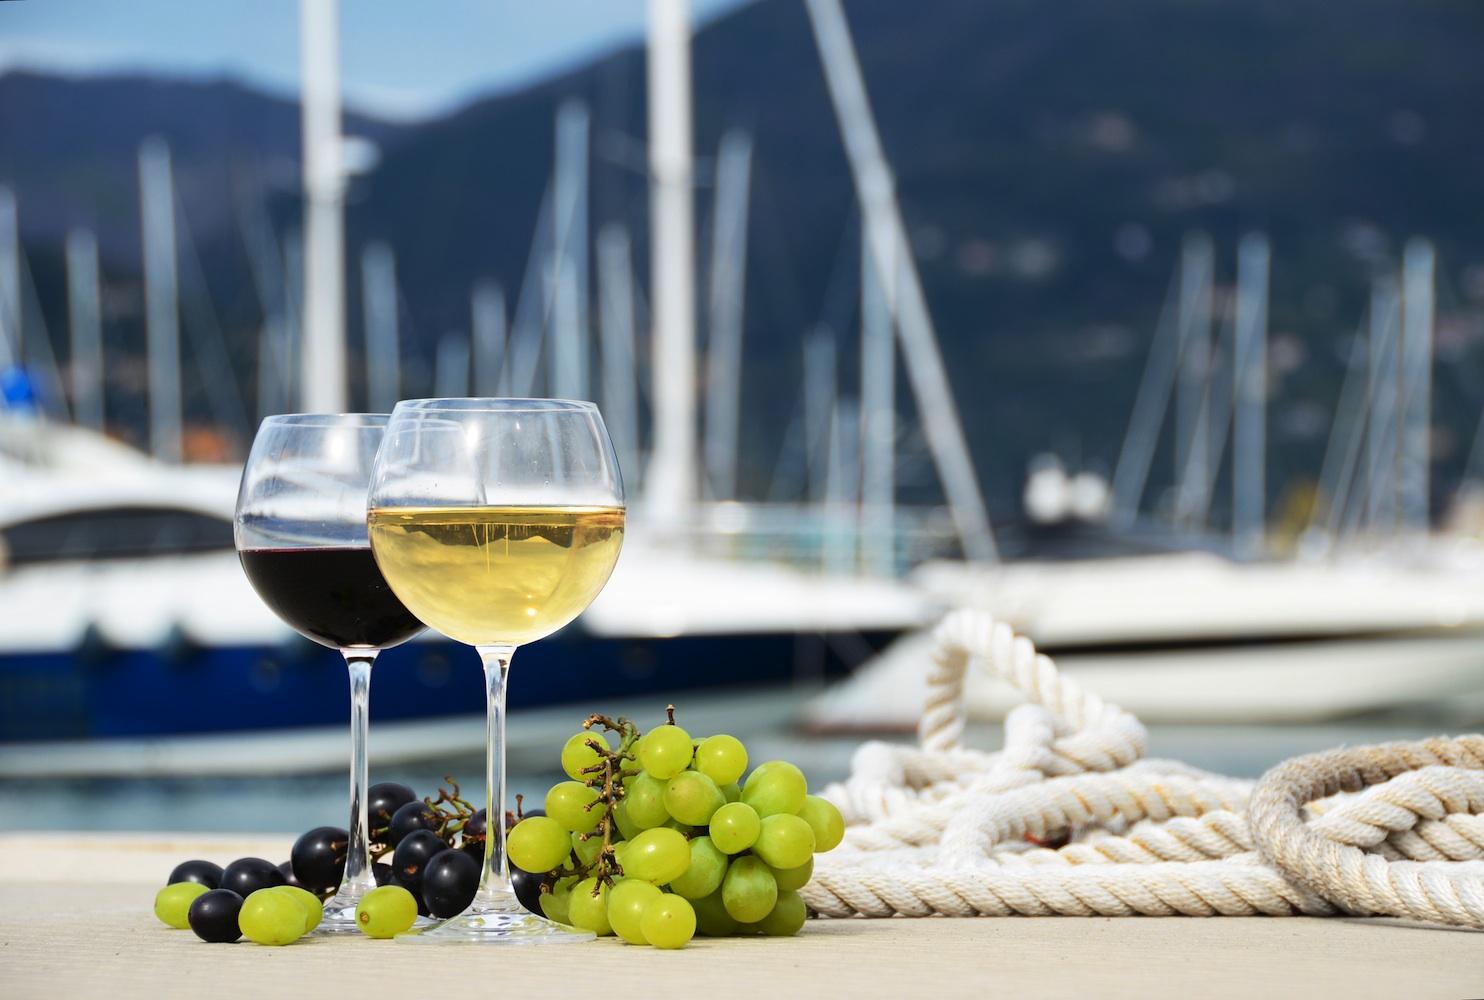 yacht-charter-Italy-wine-1